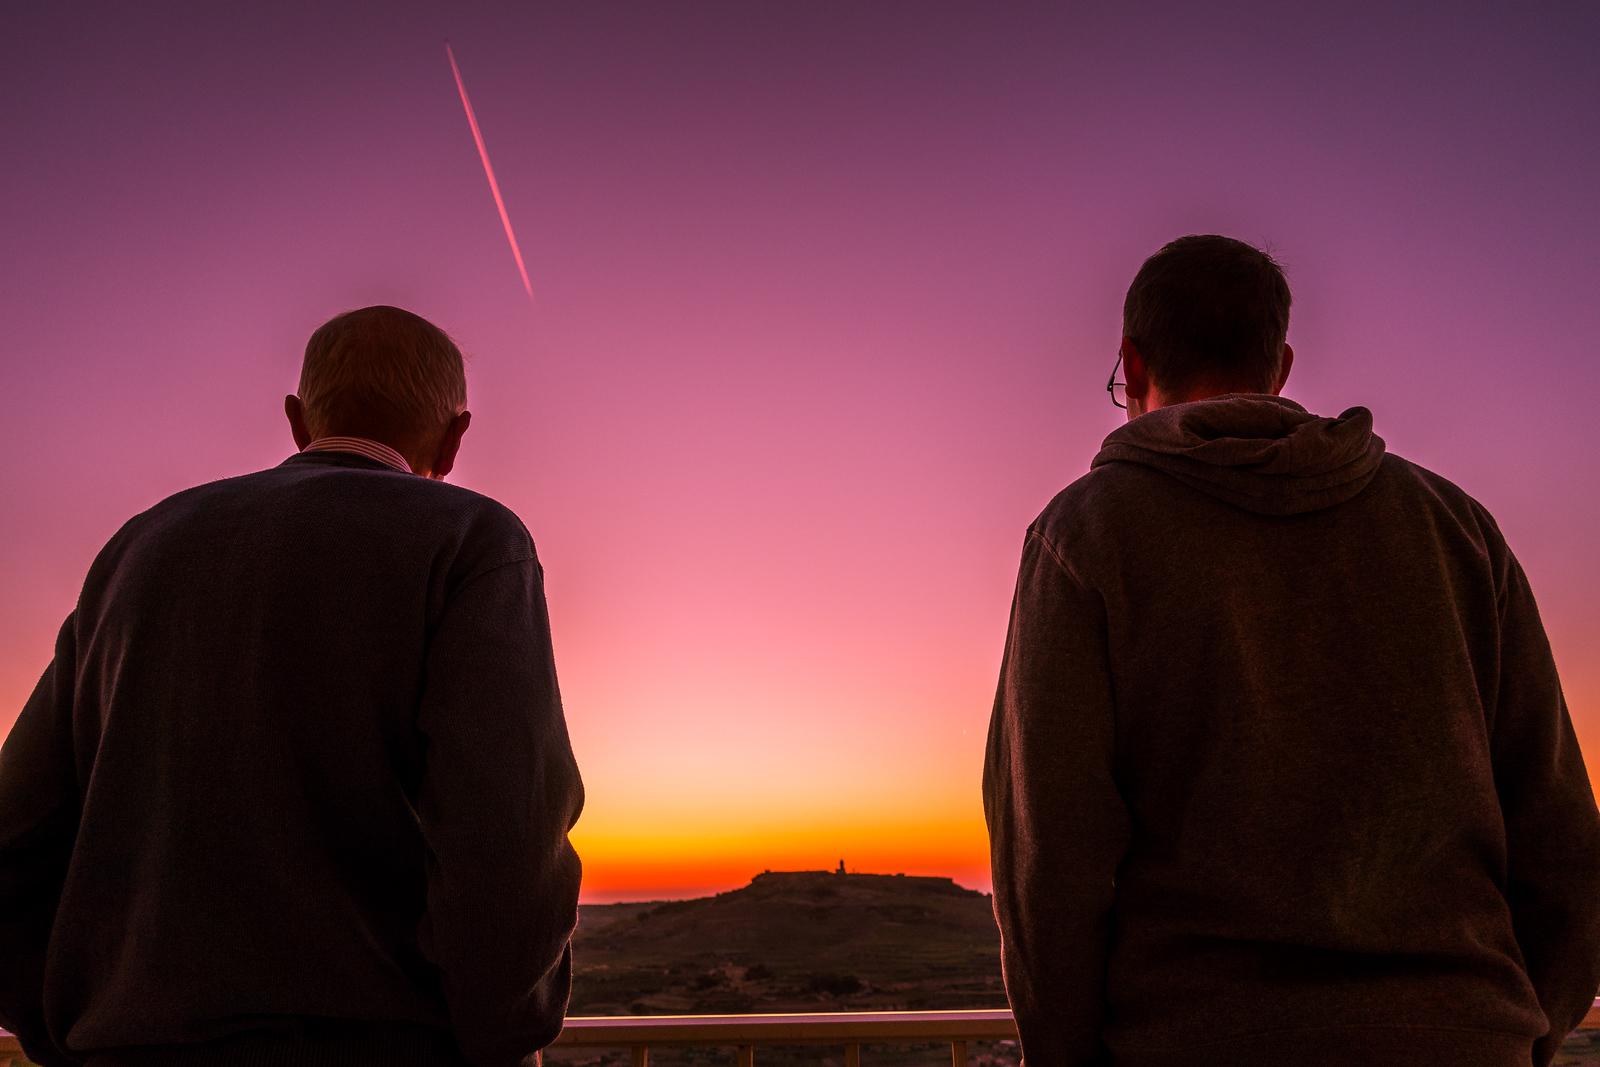 Sunset in Zebbug - Gozo, Malta